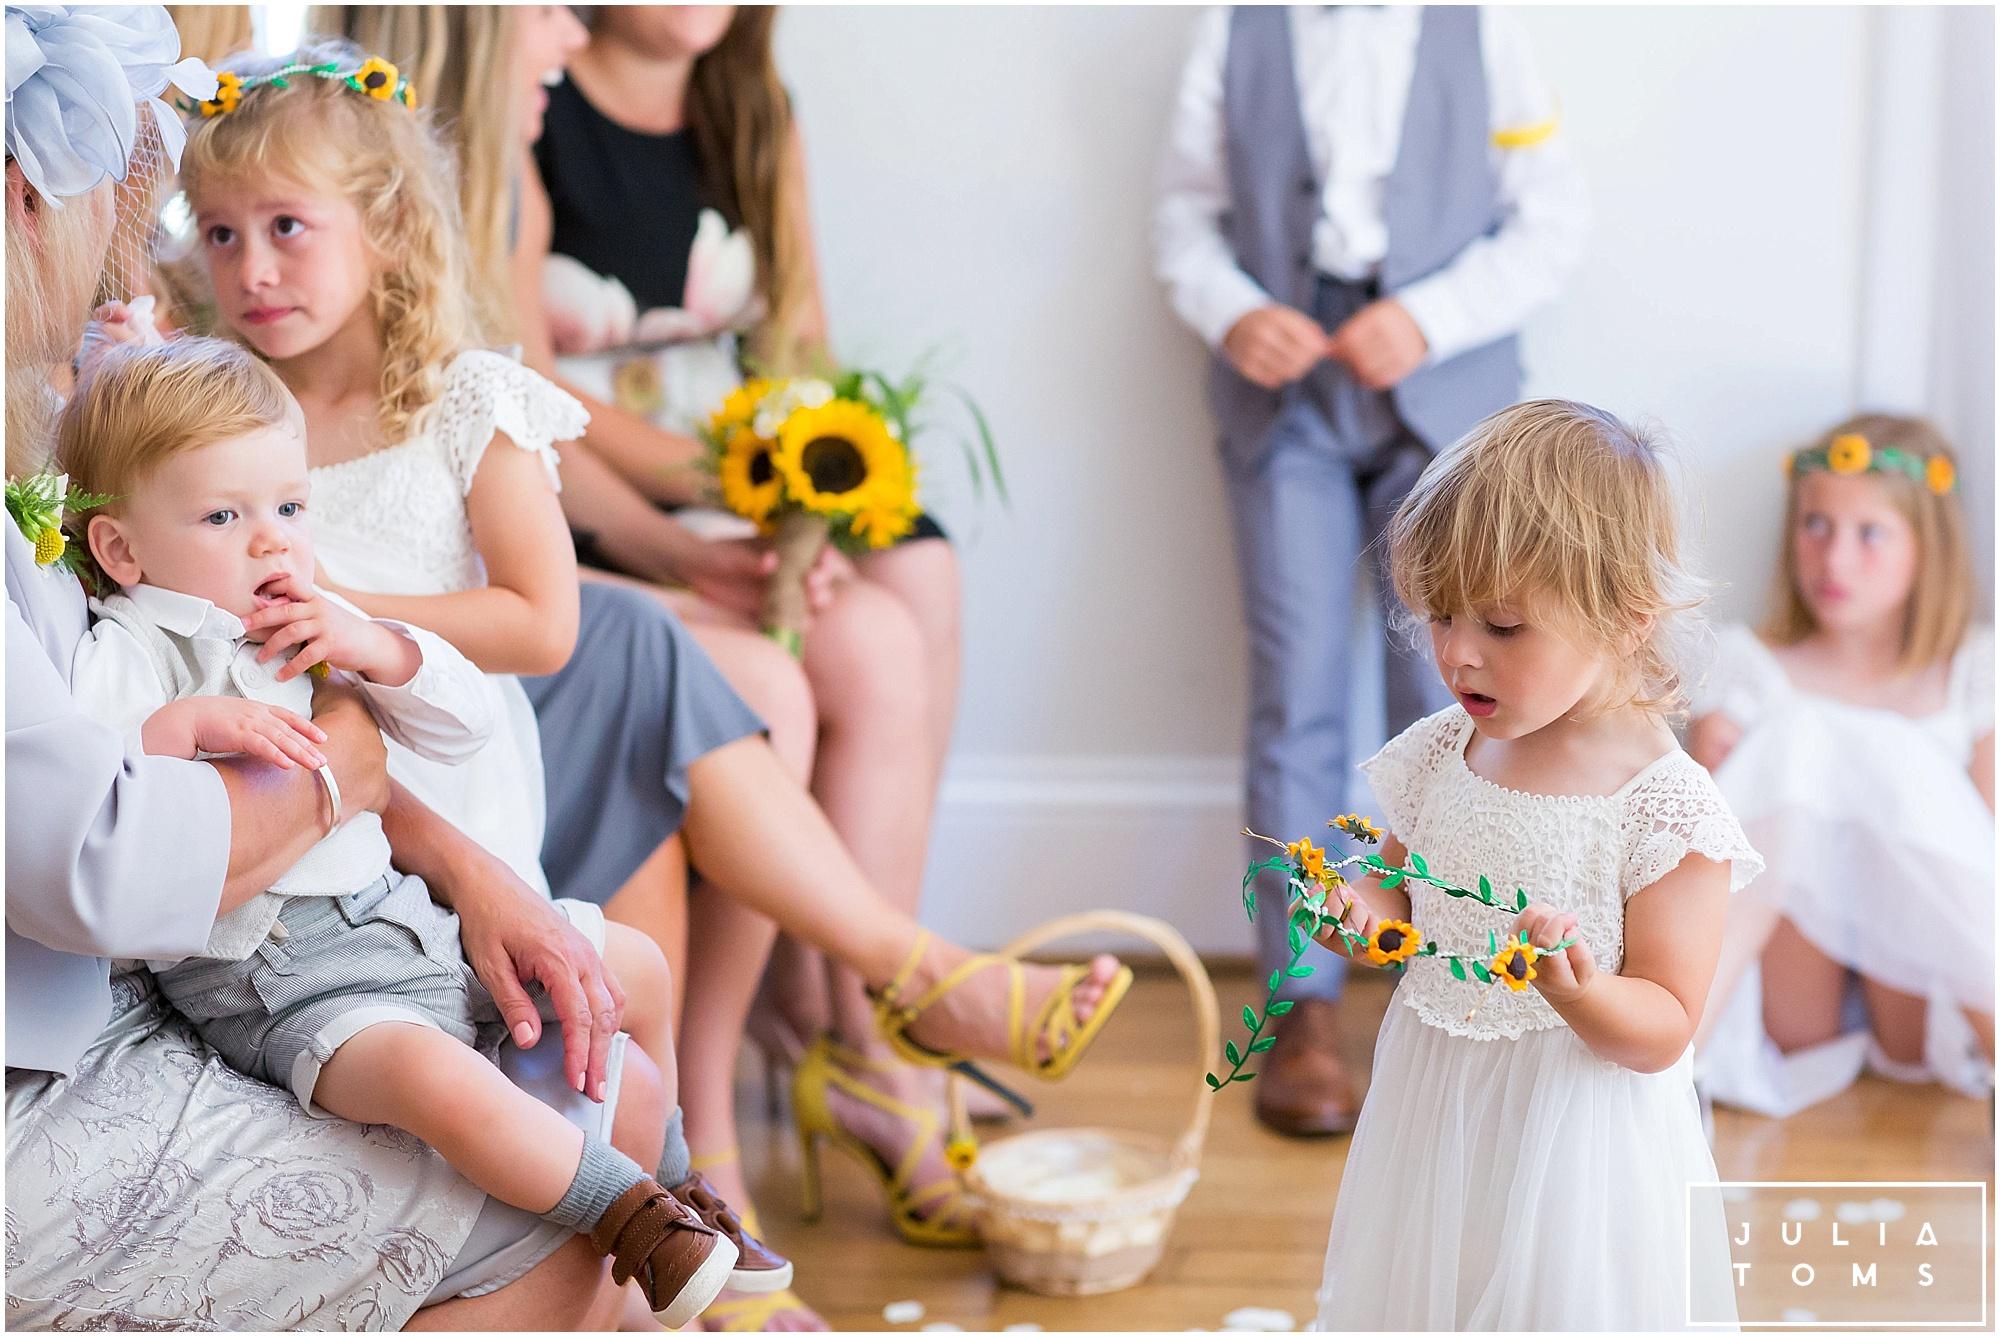 julia_toms_chichester_wedding_photographer_worthing_040.jpg